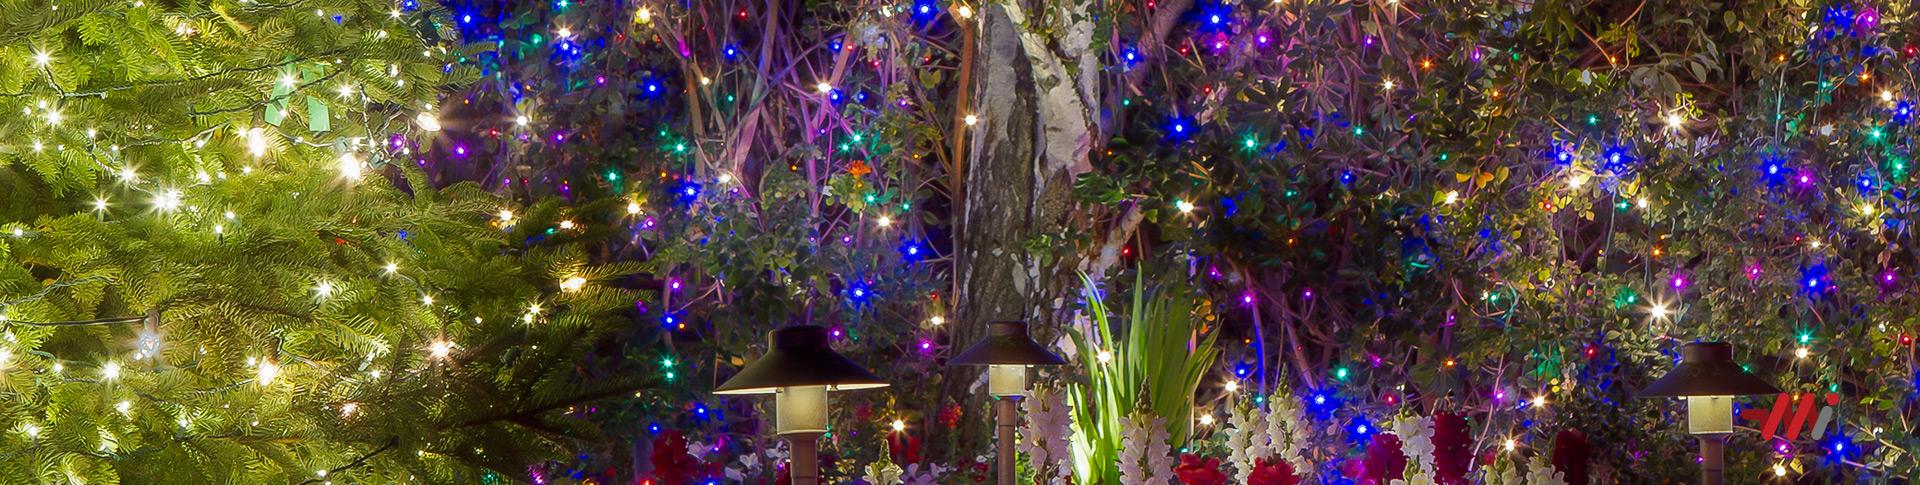 Holiday Lighting Installation